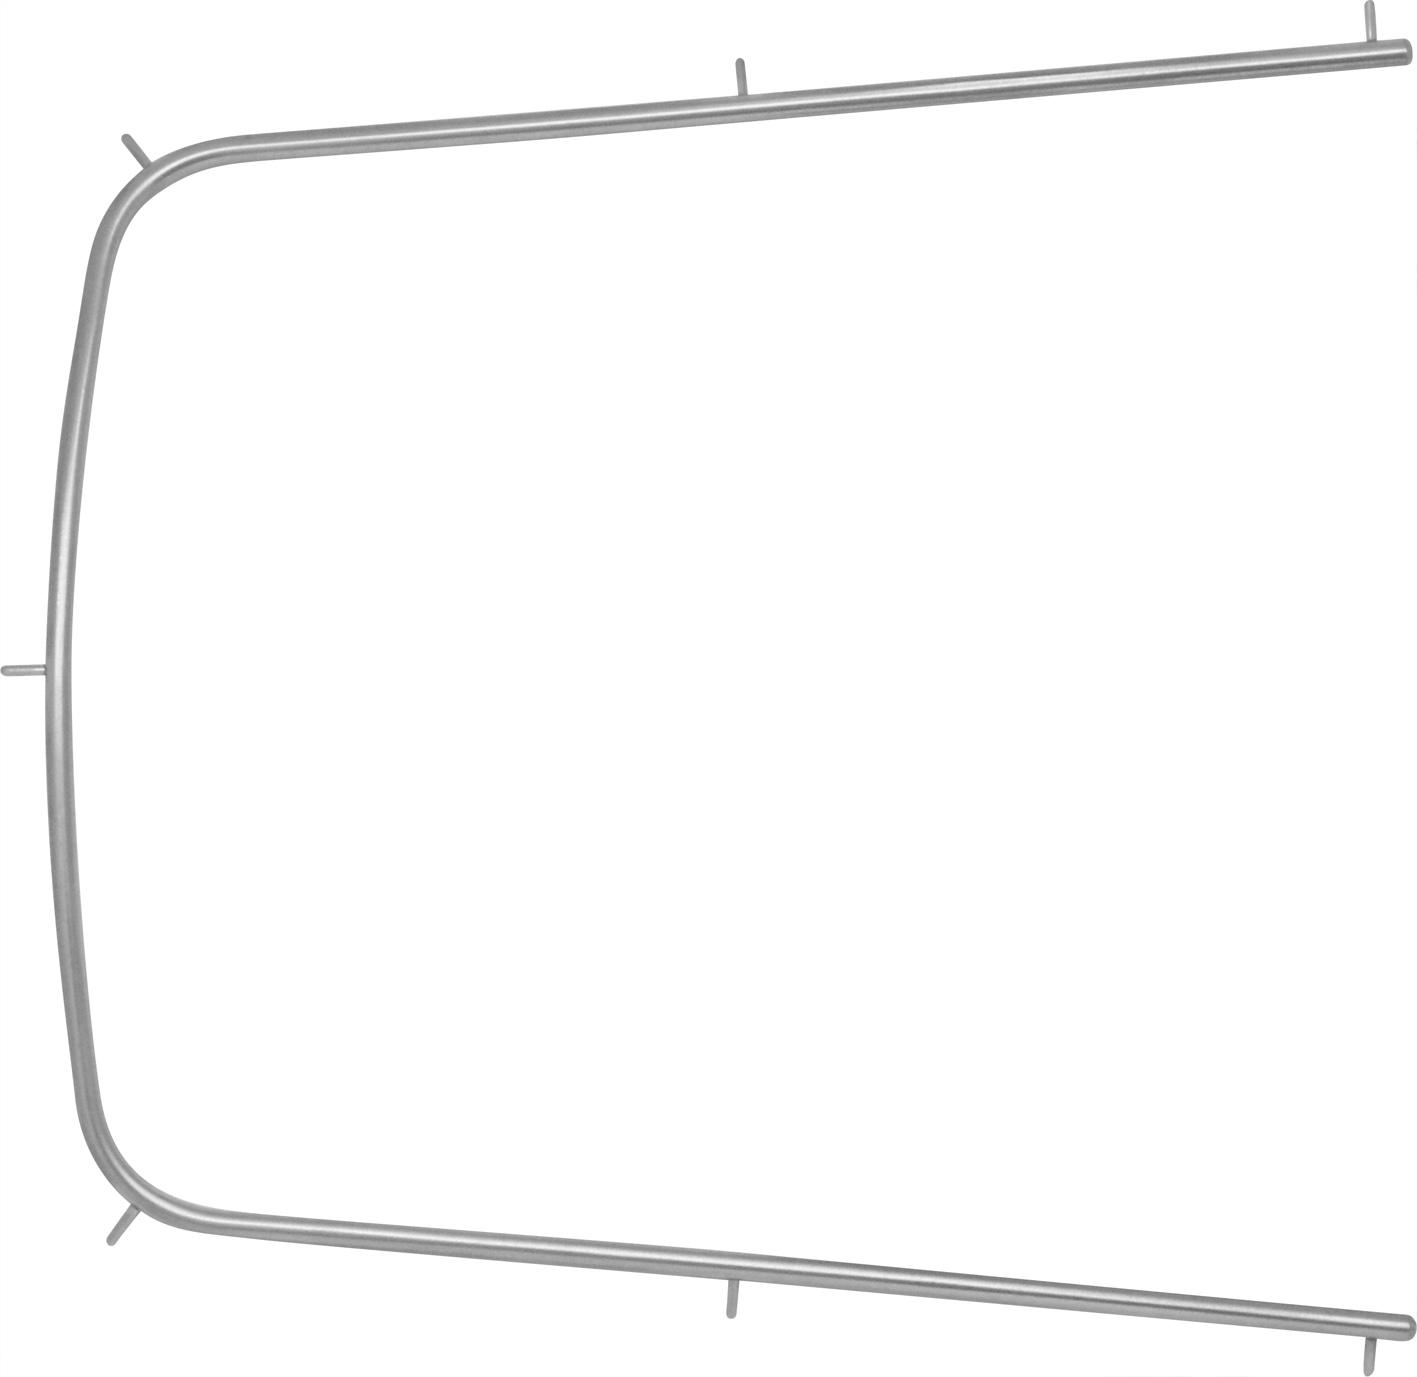 Kofferdam-Rahmen | 100 x 121 mm